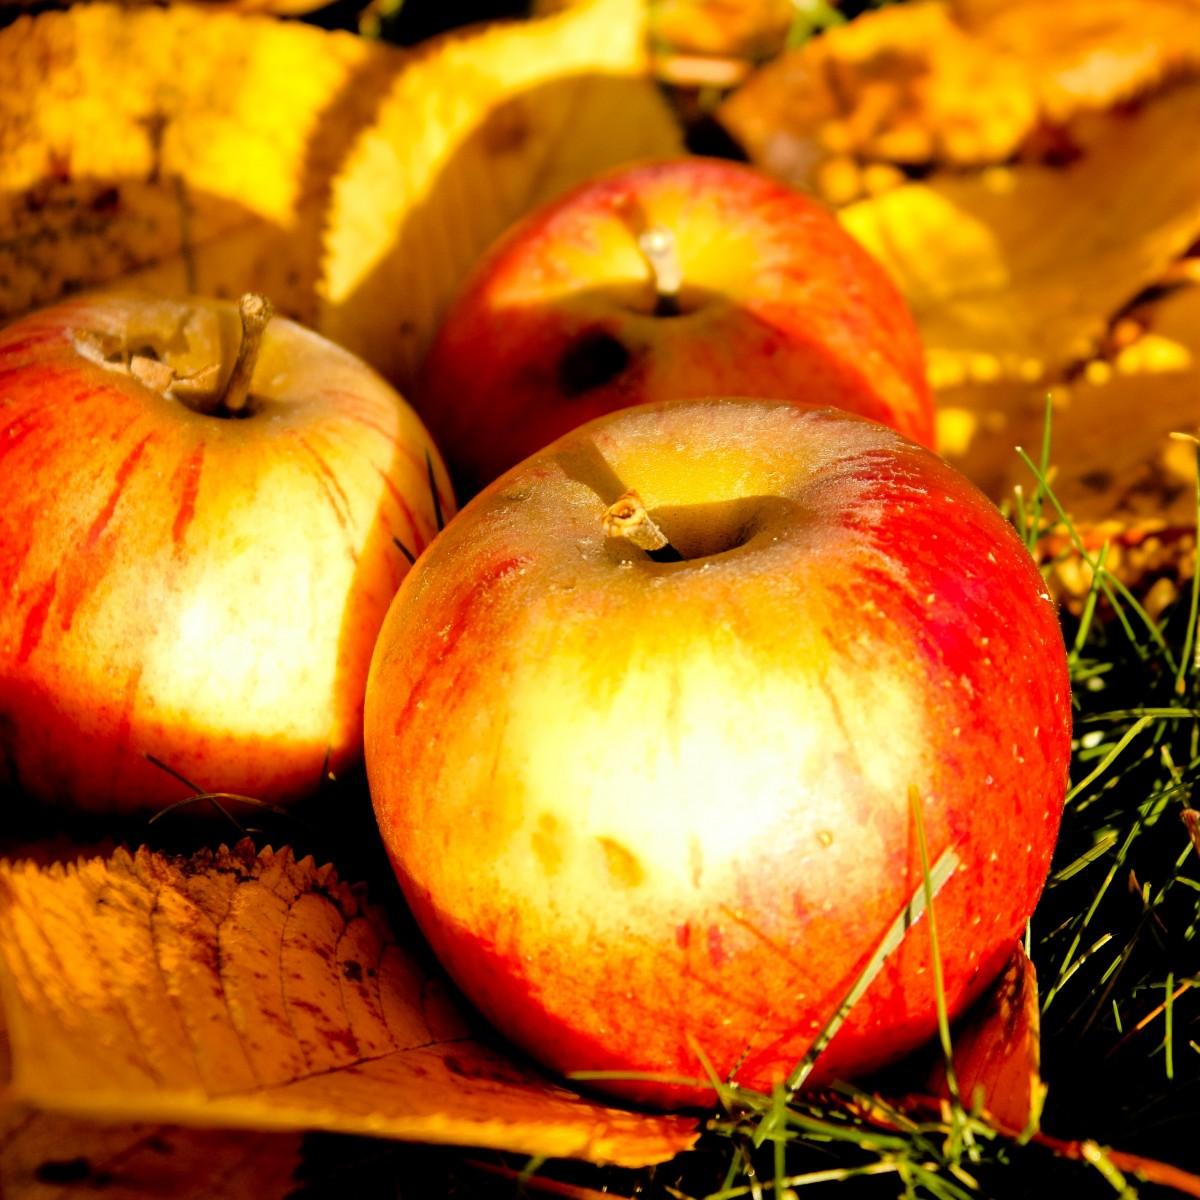 Картинки яблок и грибов